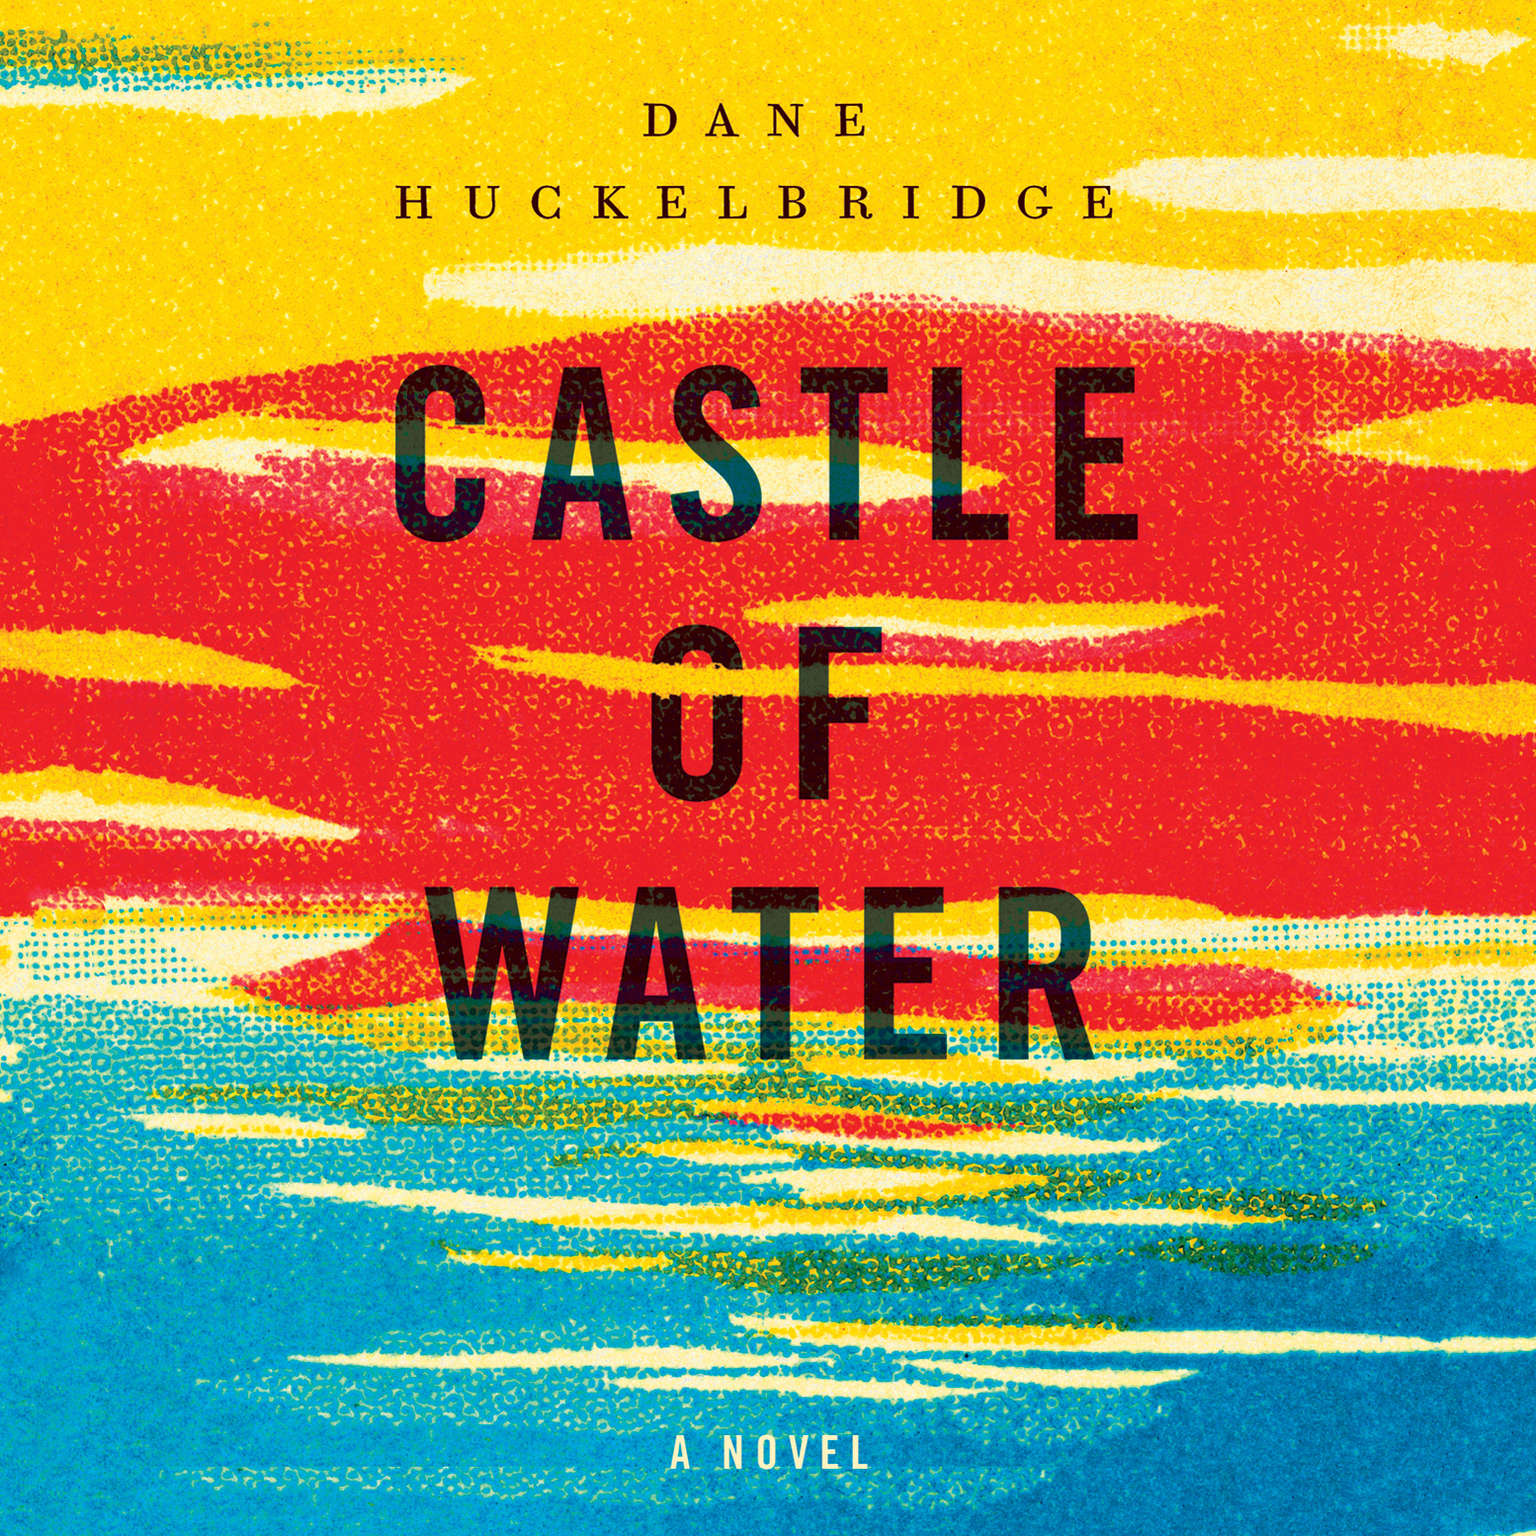 Castle of Water: A Novel Audiobook, by Dane Huckelbridge